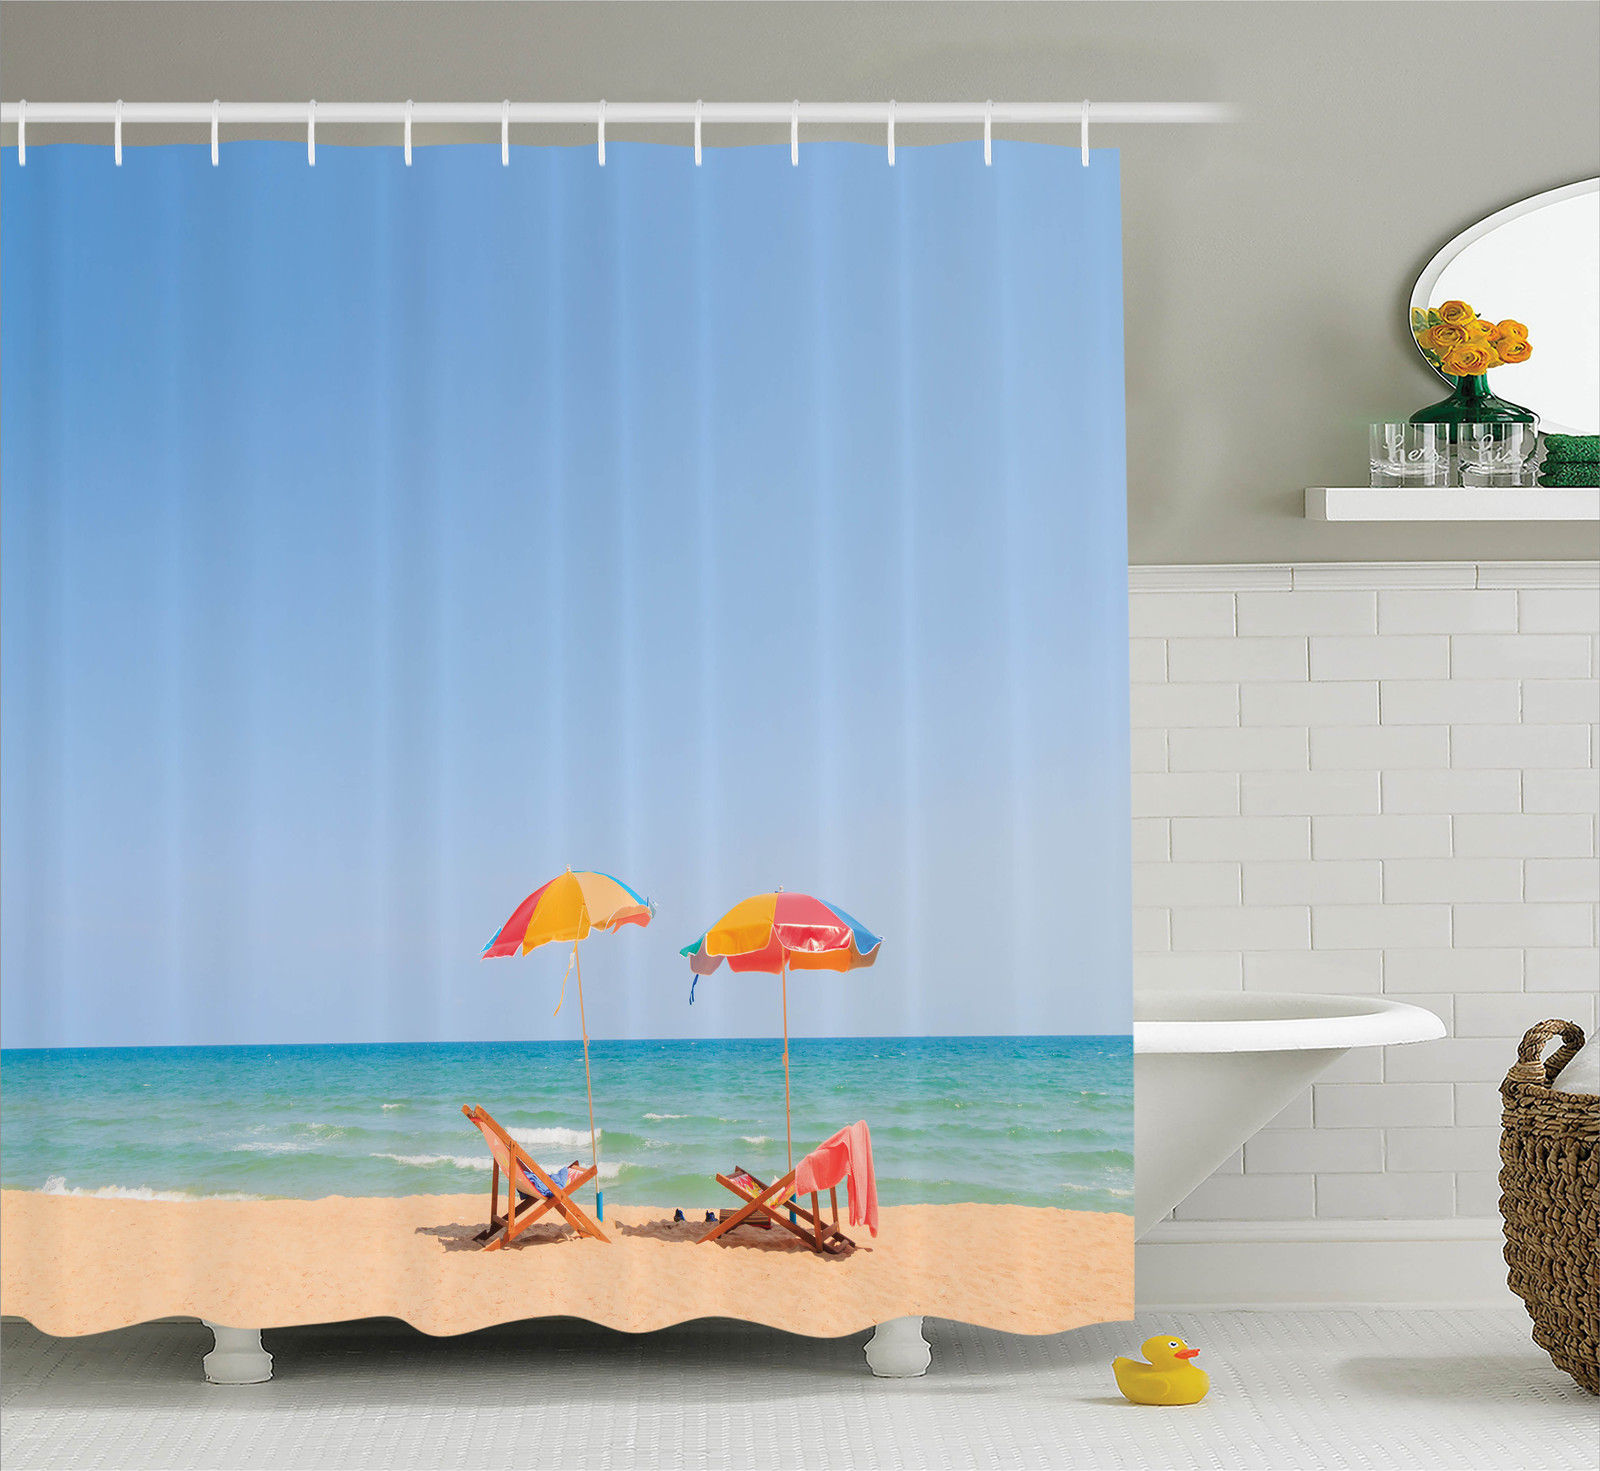 Beach Chair Shower Curtain - Image is loading beach chair umbrella leisure relax meditation decor photo